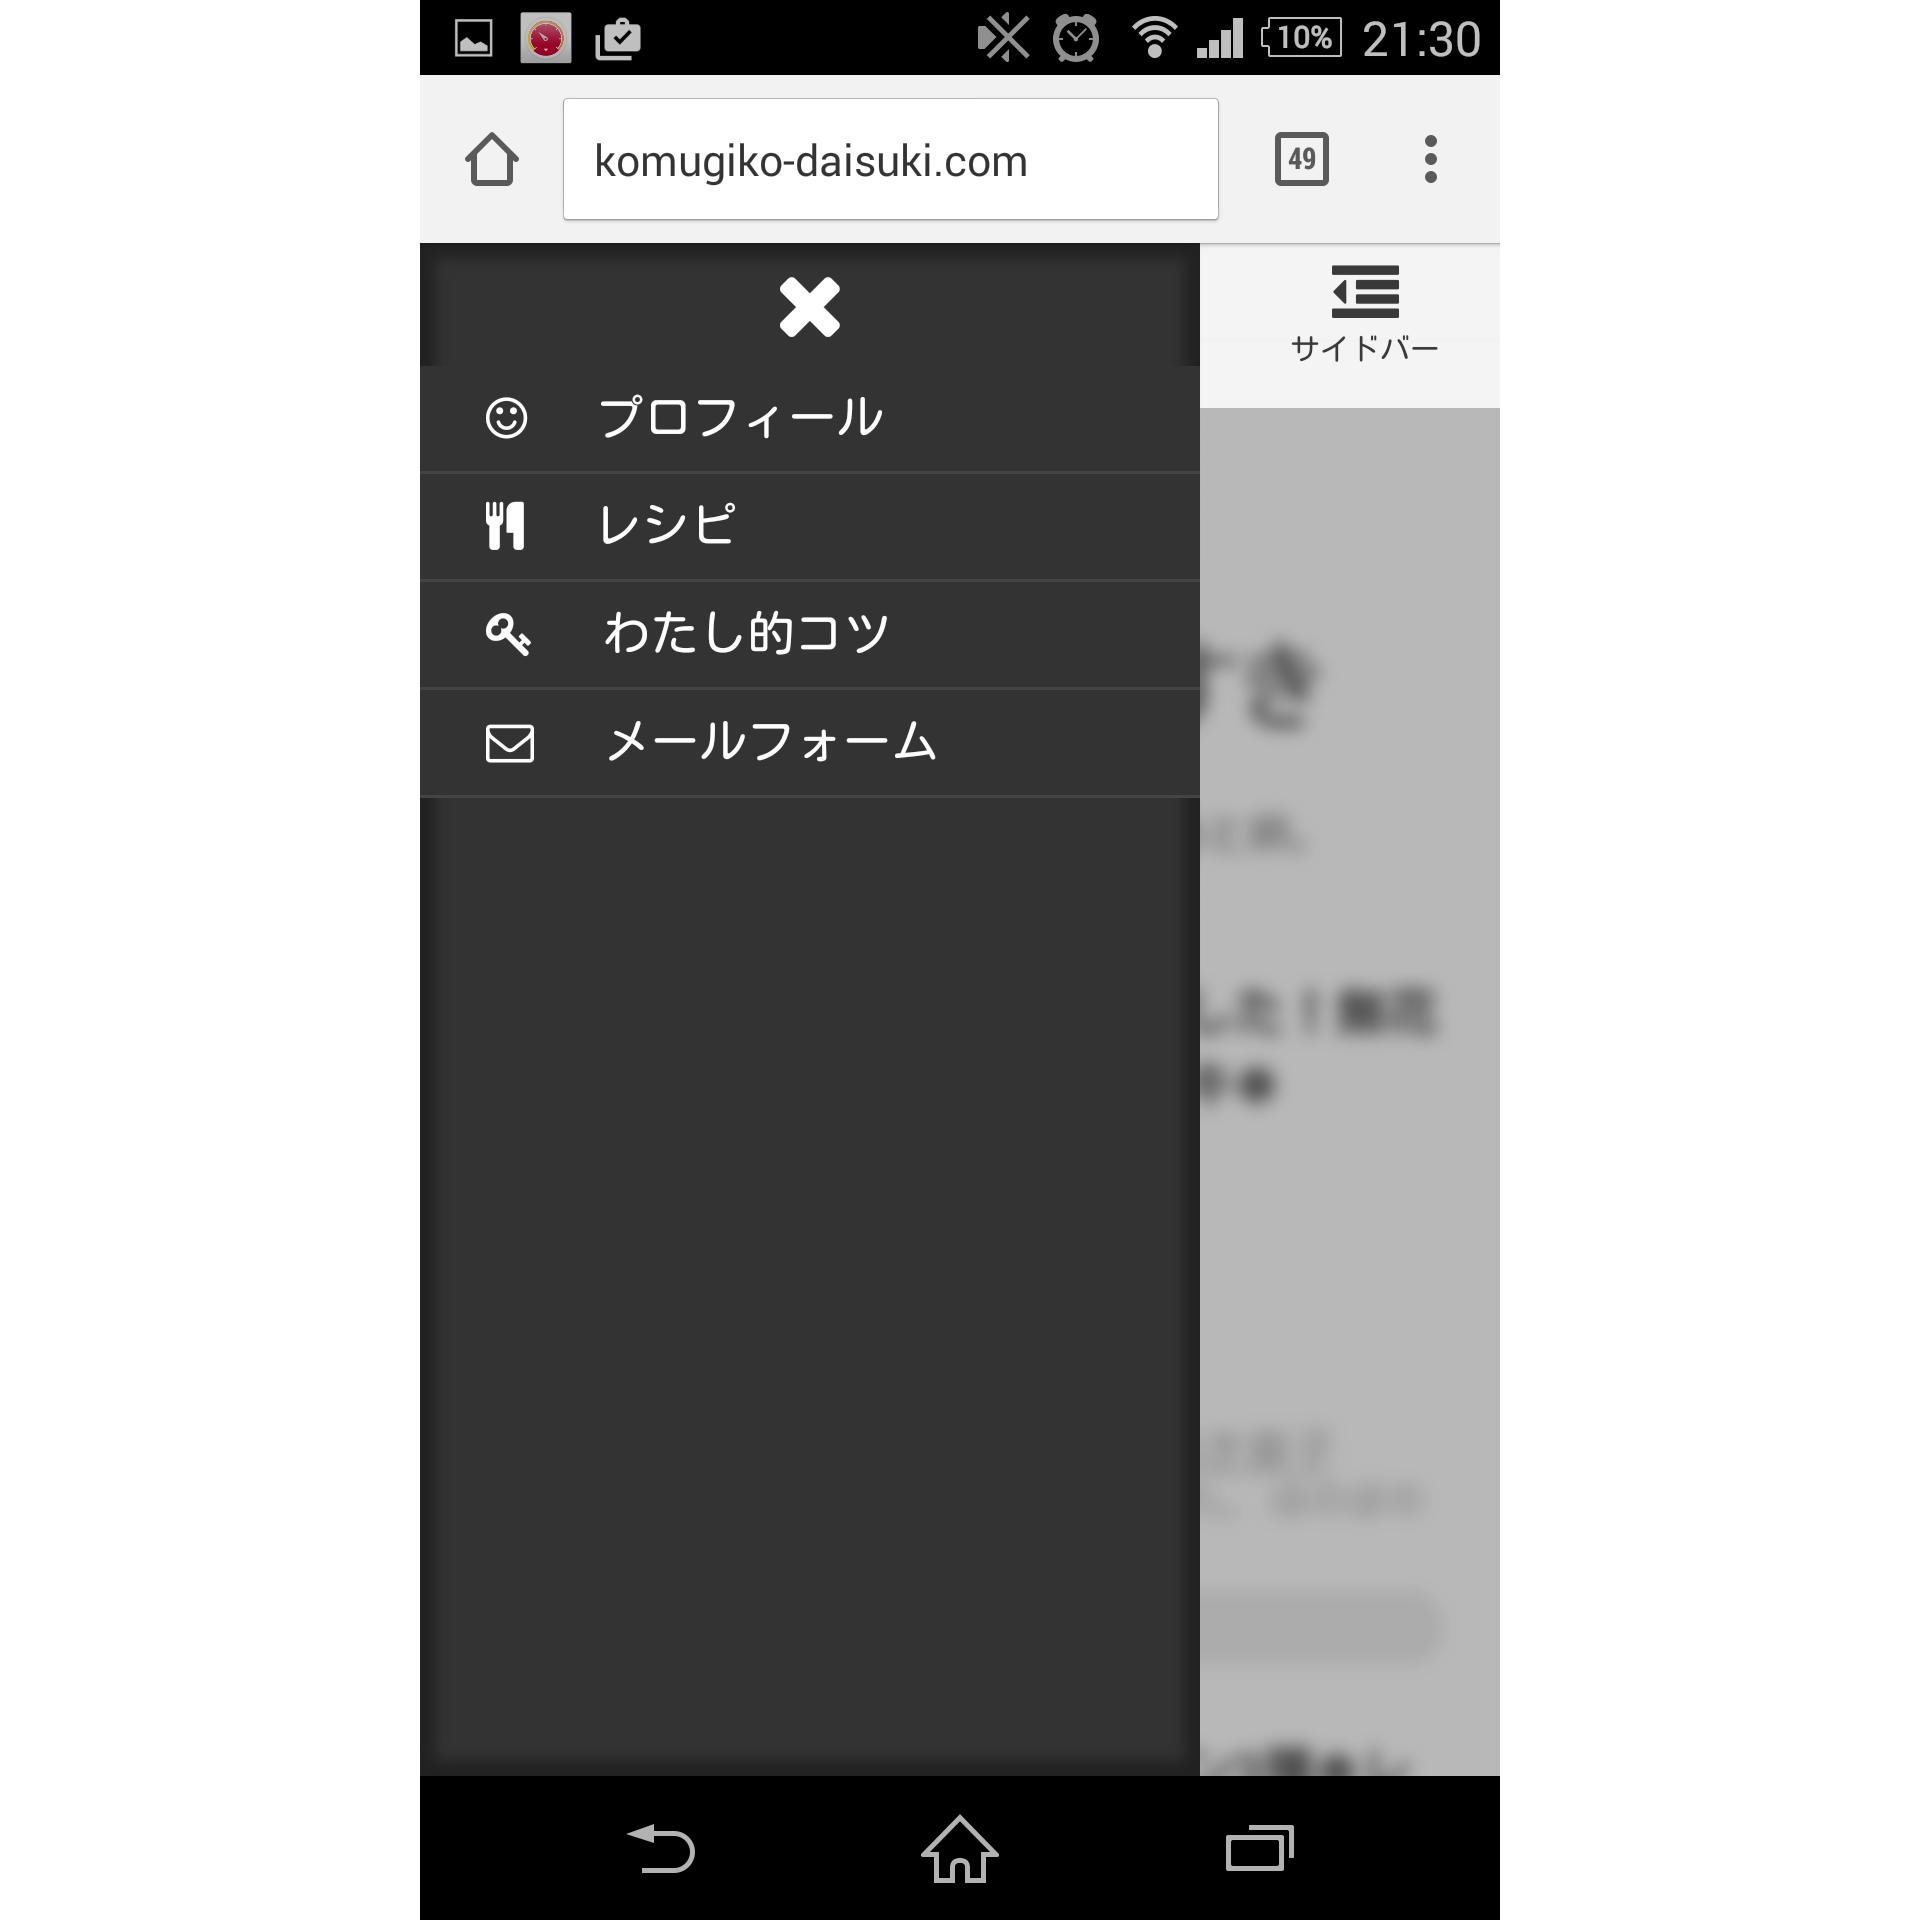 Screenshot_2015-07-02-21-30-22